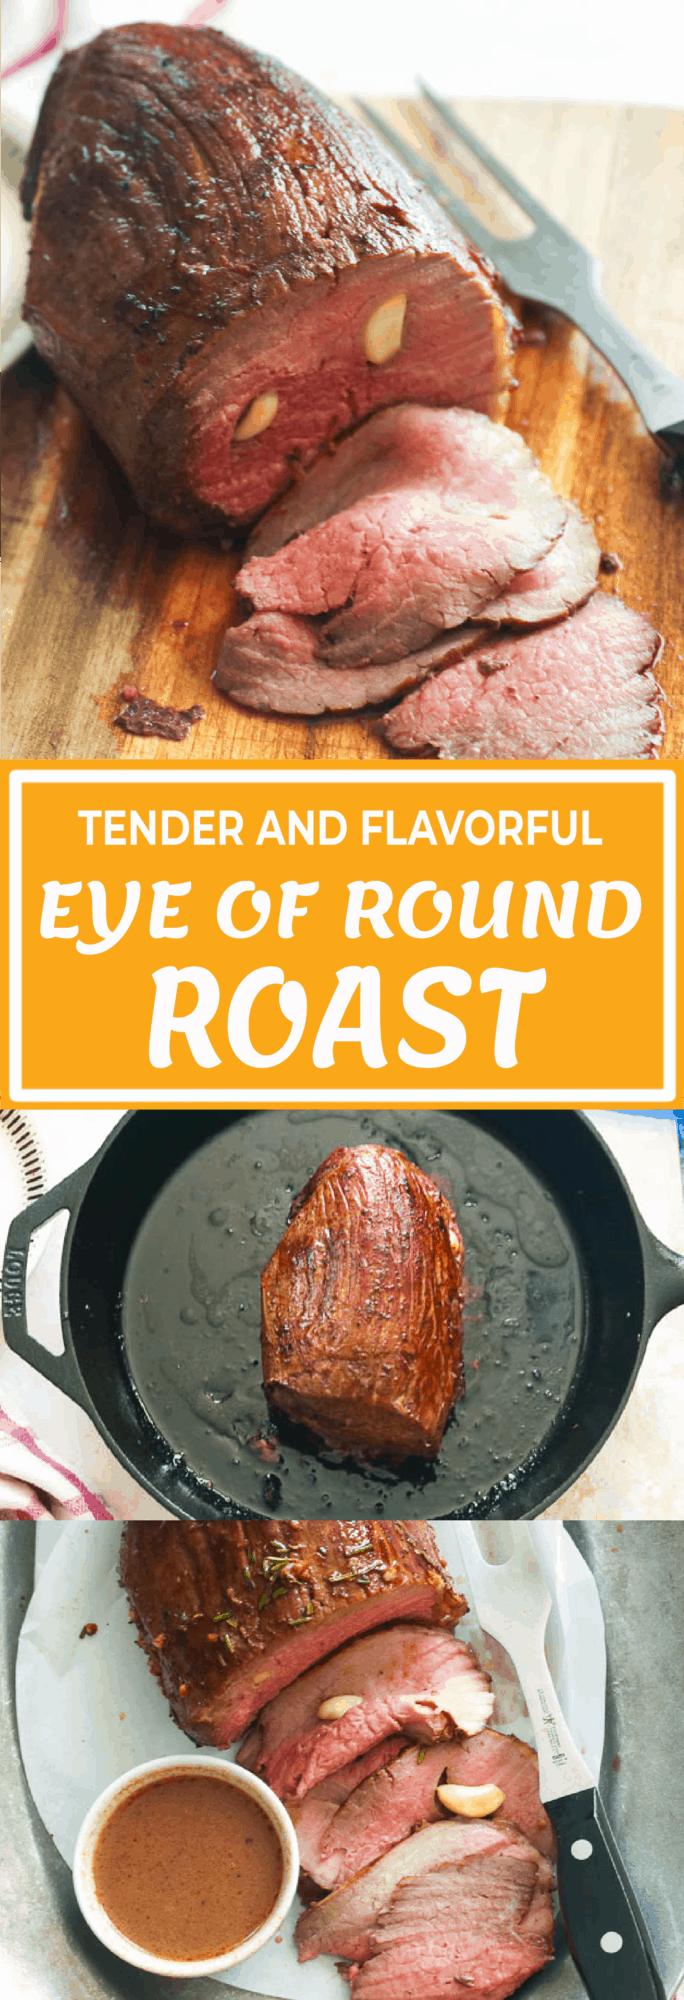 Eye of Round Roast